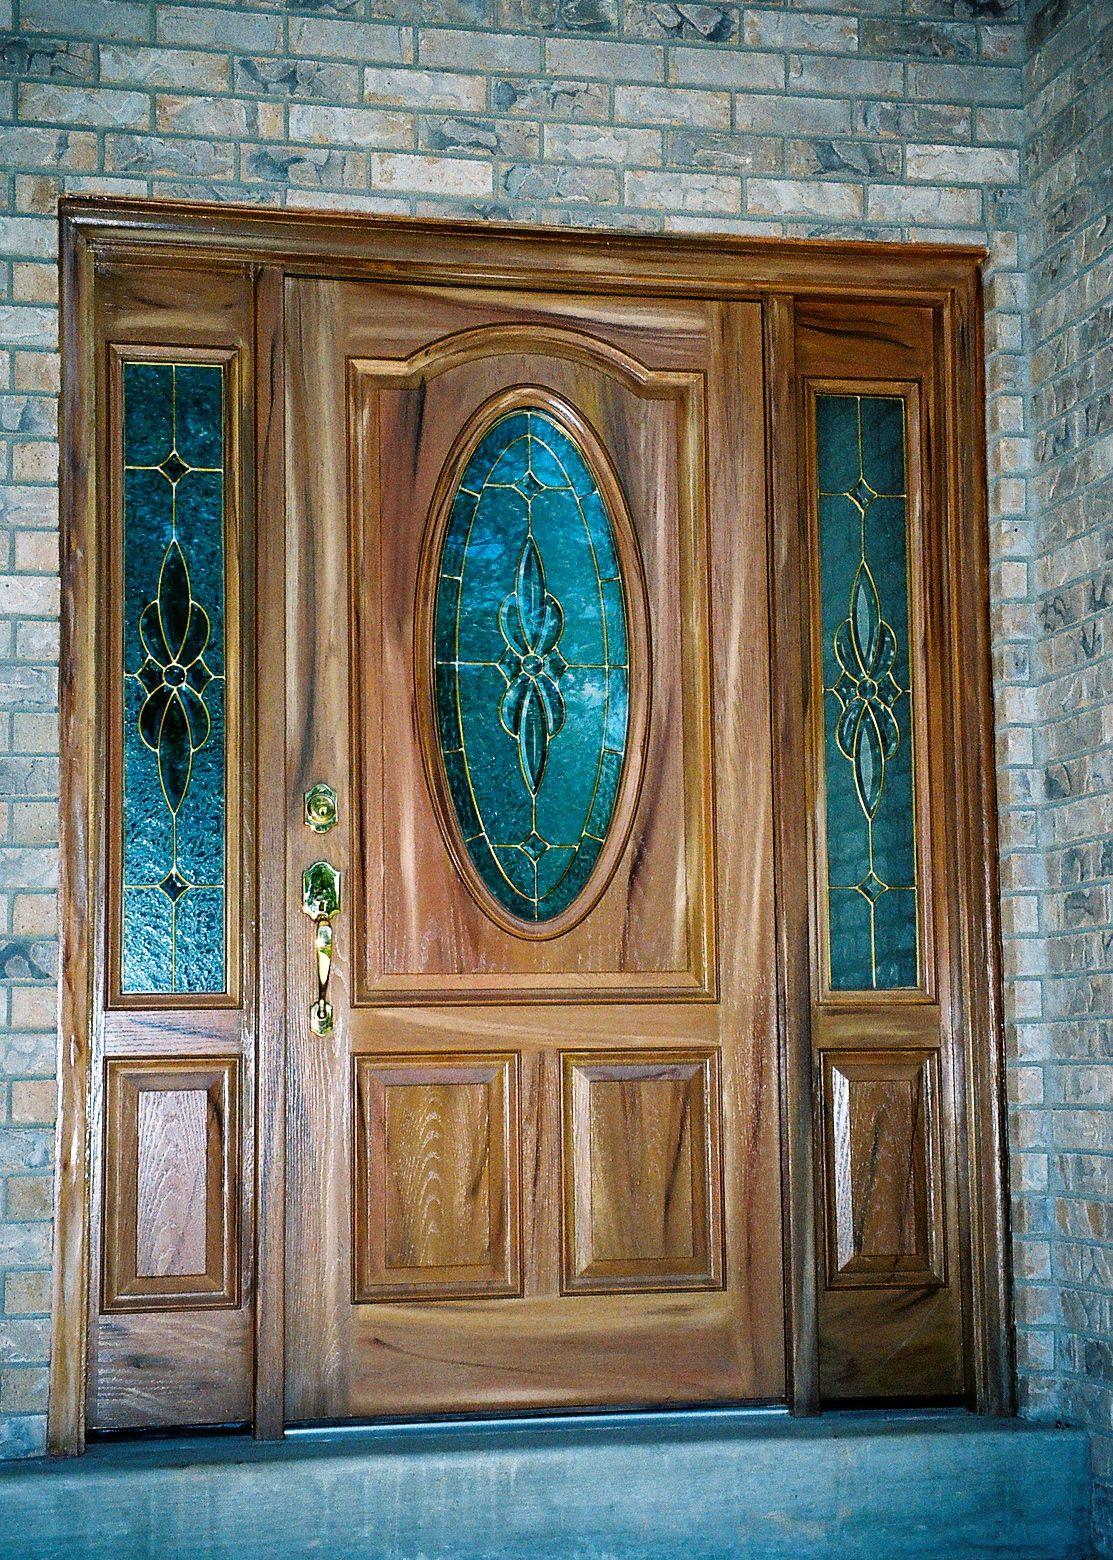 Refinished Fiberglass Door with Side Panels